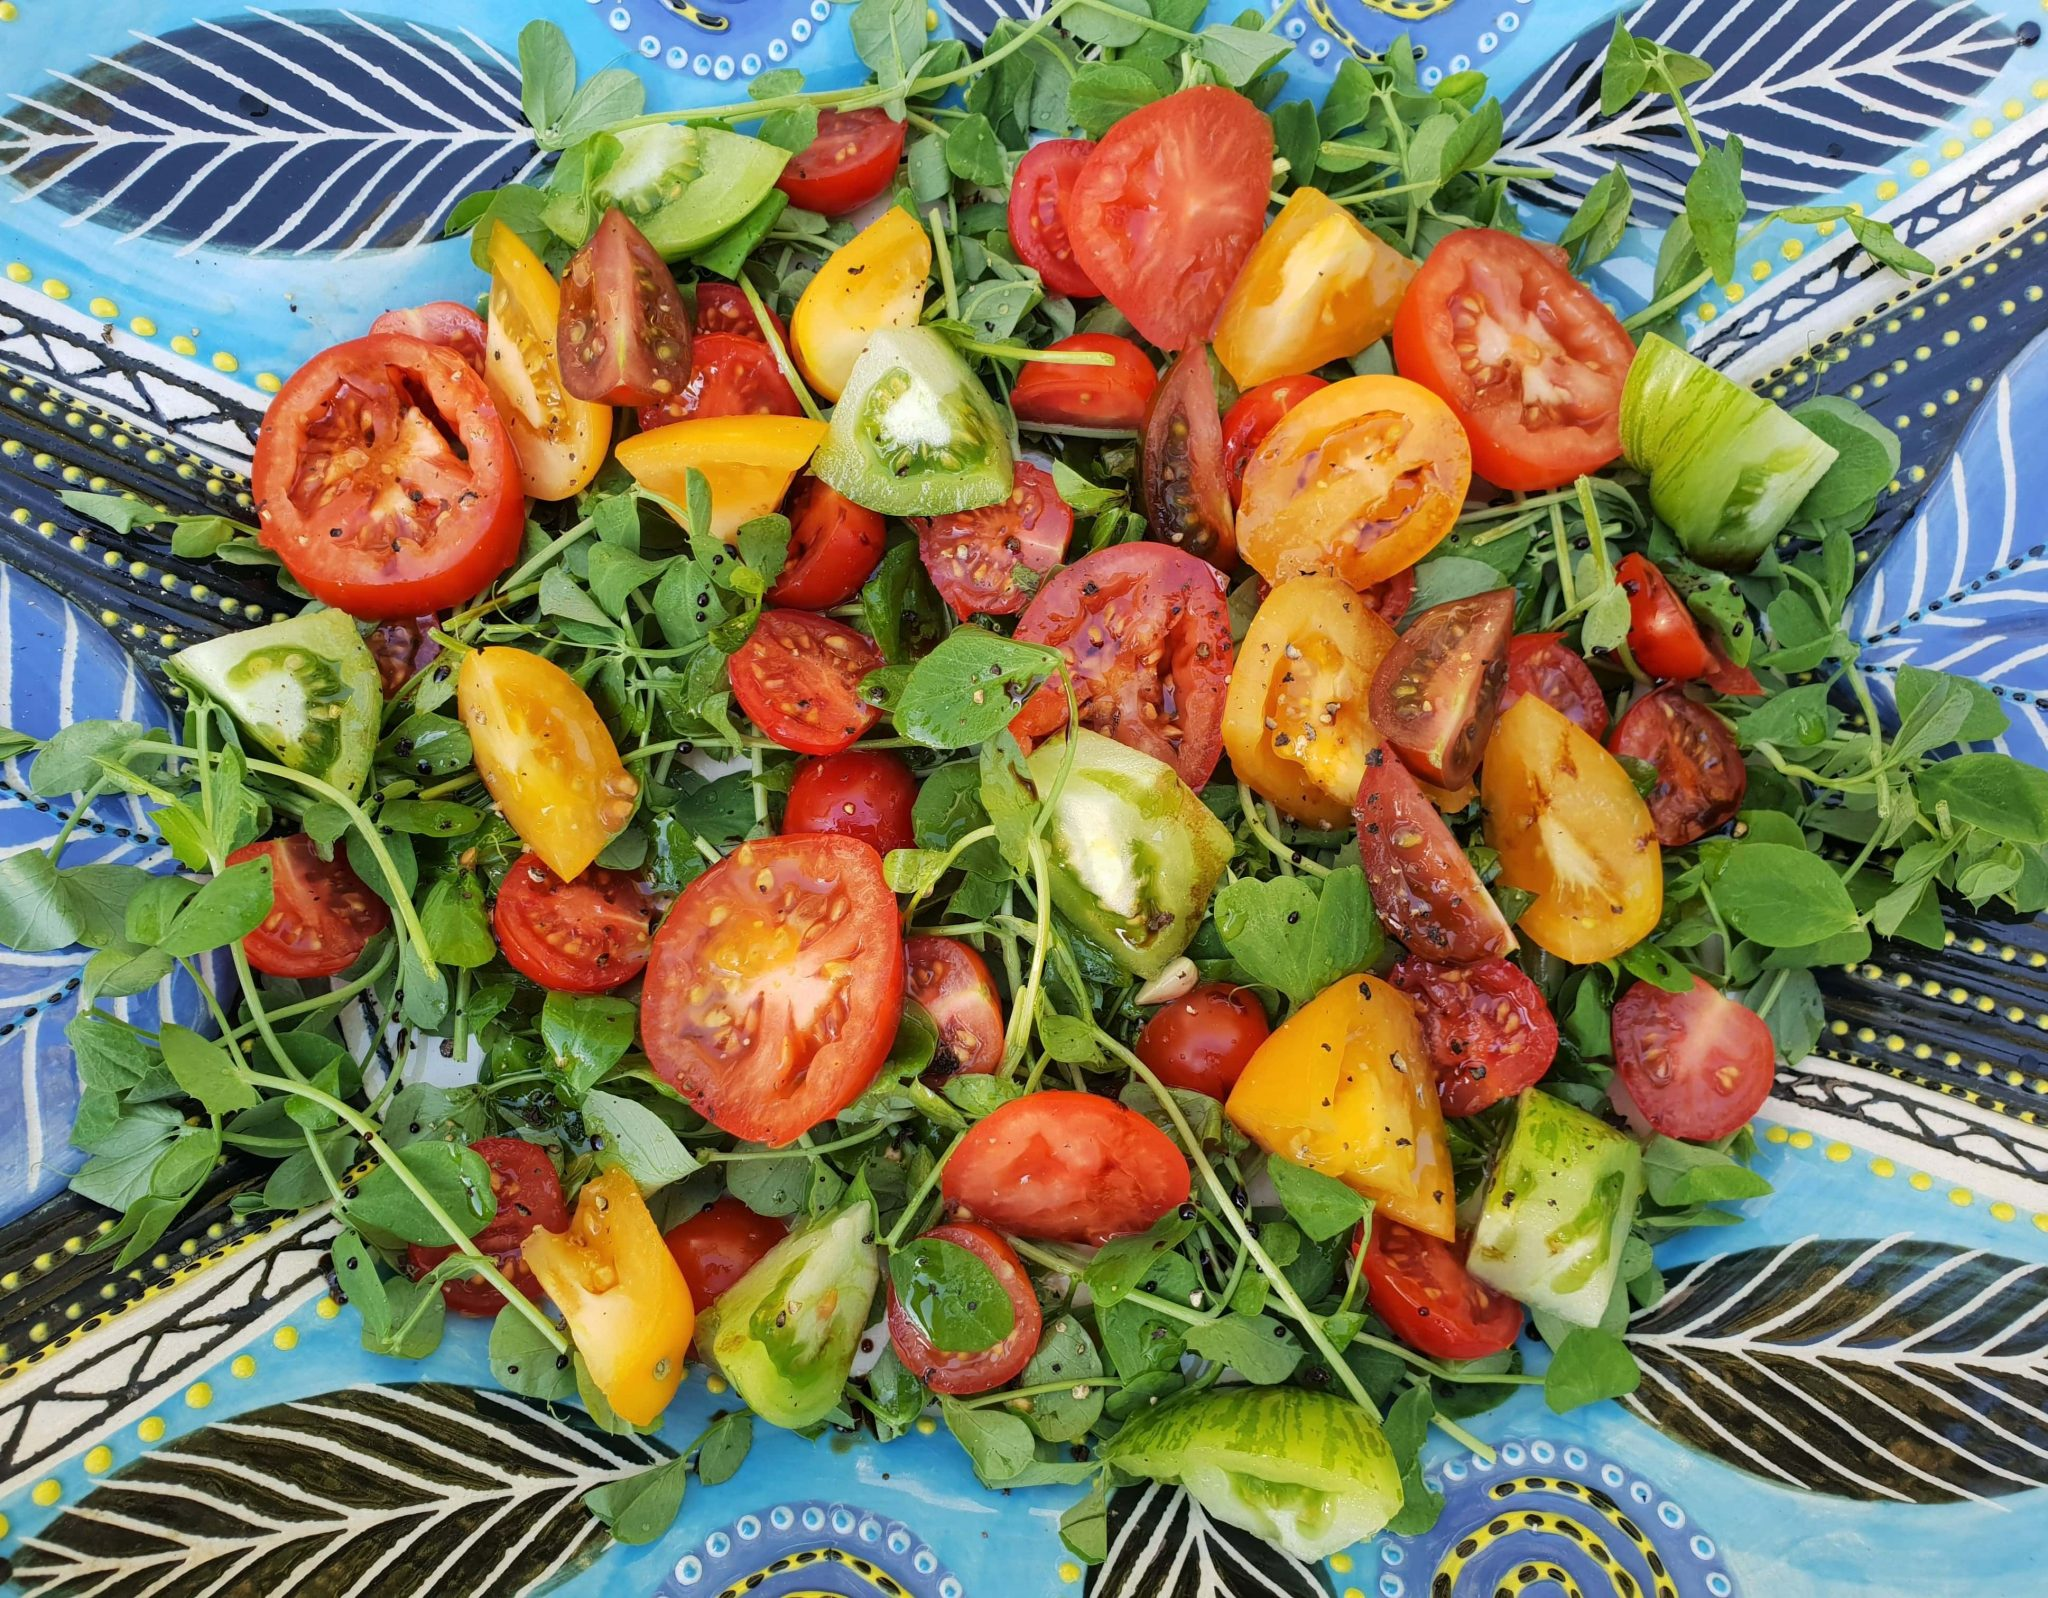 Natures Choice heirloom tomato and pea shoot salad